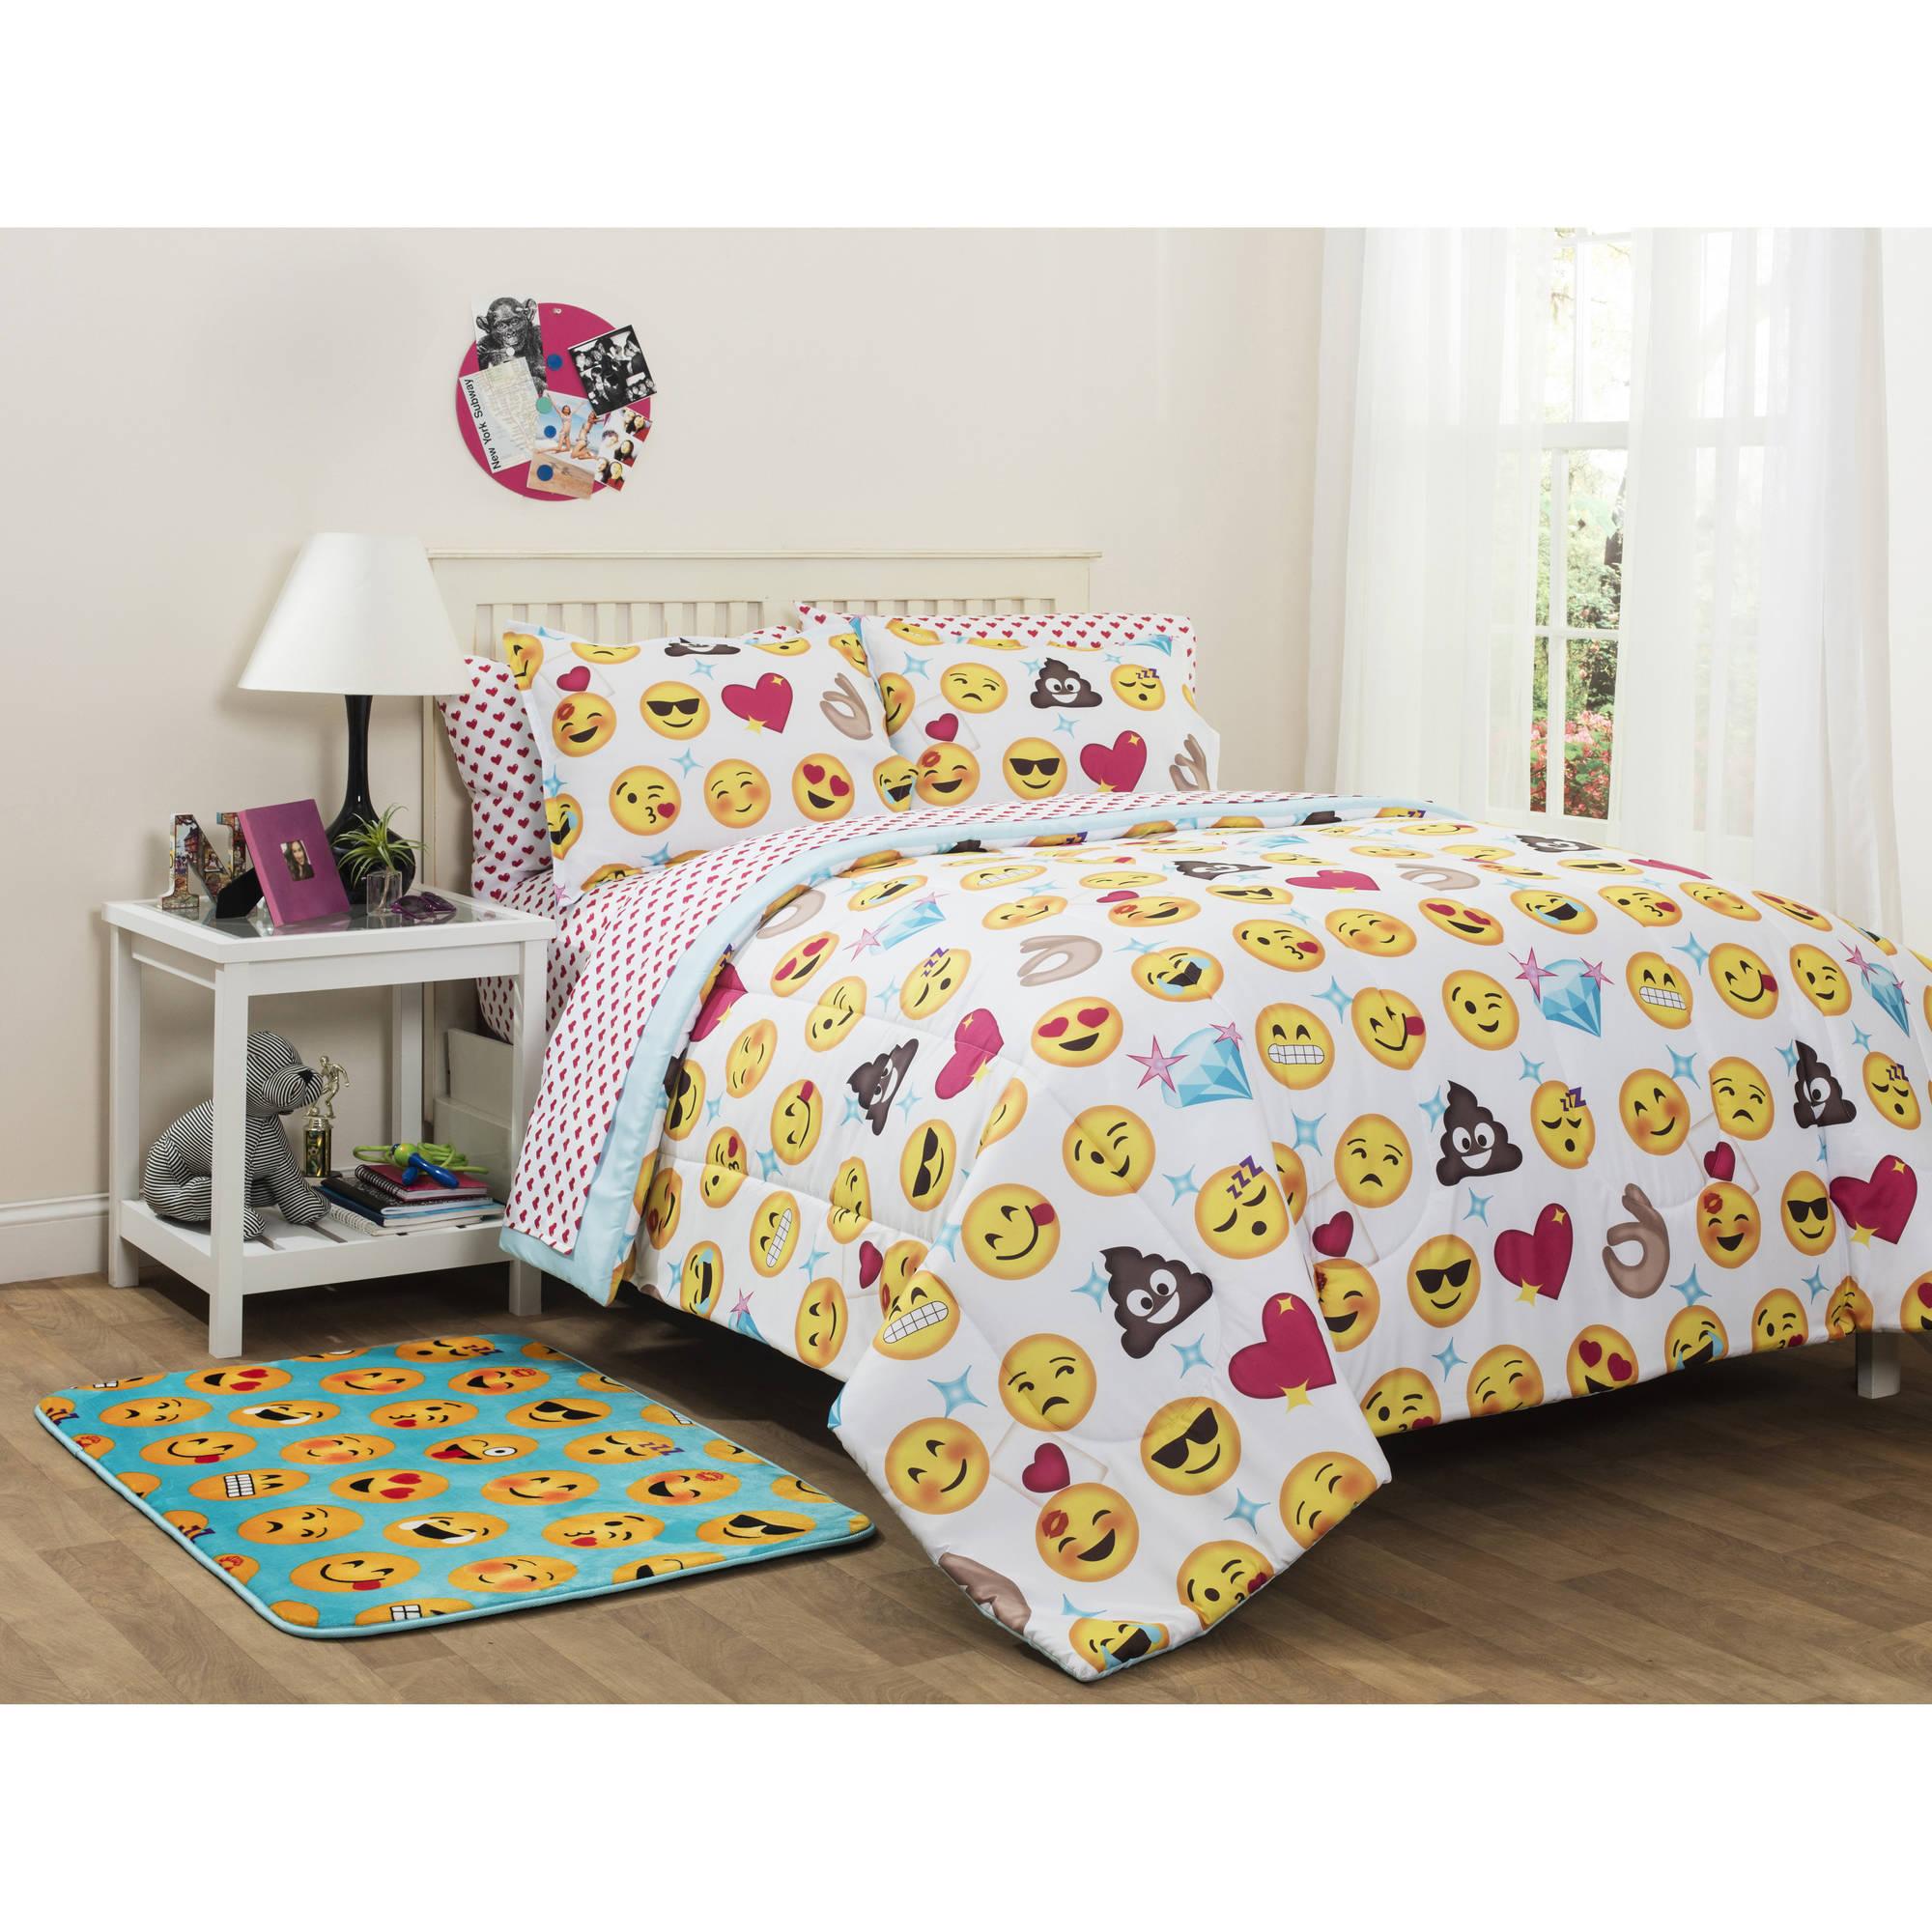 Emoji Reversible Bedding Set Twin Xl Bed In A Bag Kids Room Bedroom Decor